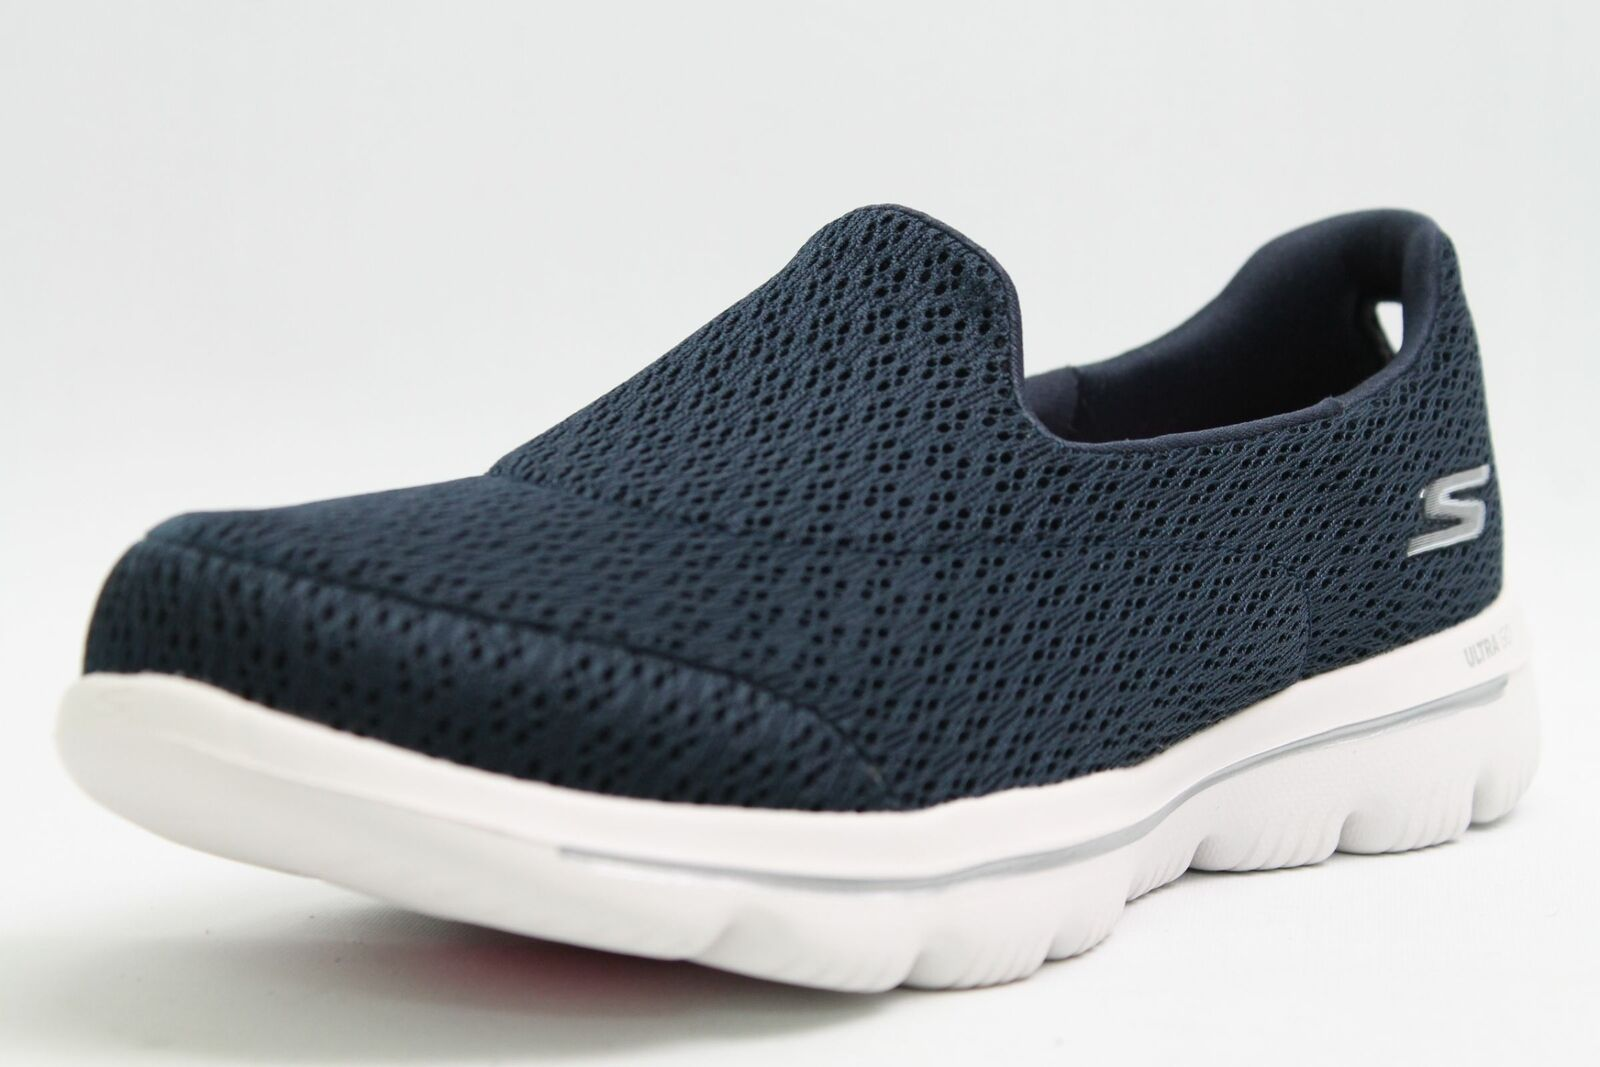 Skechers Schuhe blau Meshgewebe atmungsaktiv ultra go Air-Cooled Damen Turnschuhe